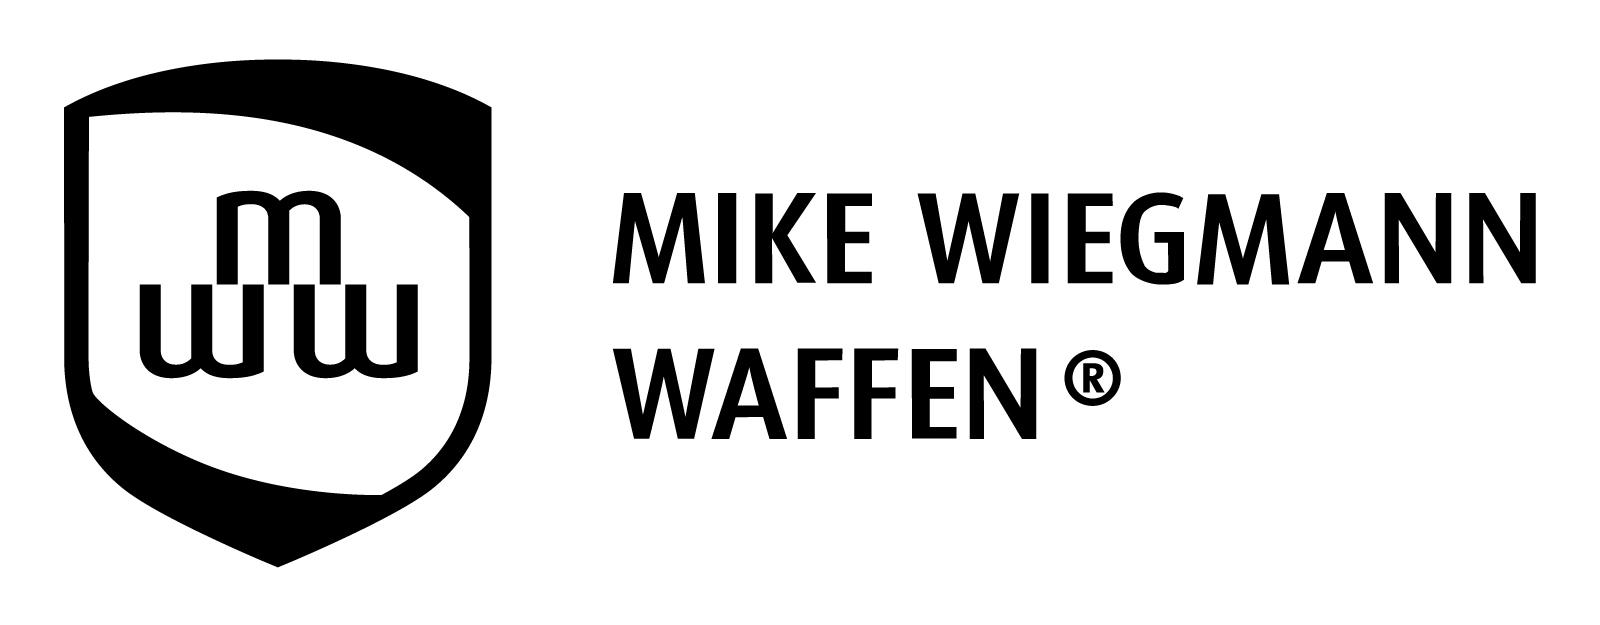 Mike Wiegmann Waffen